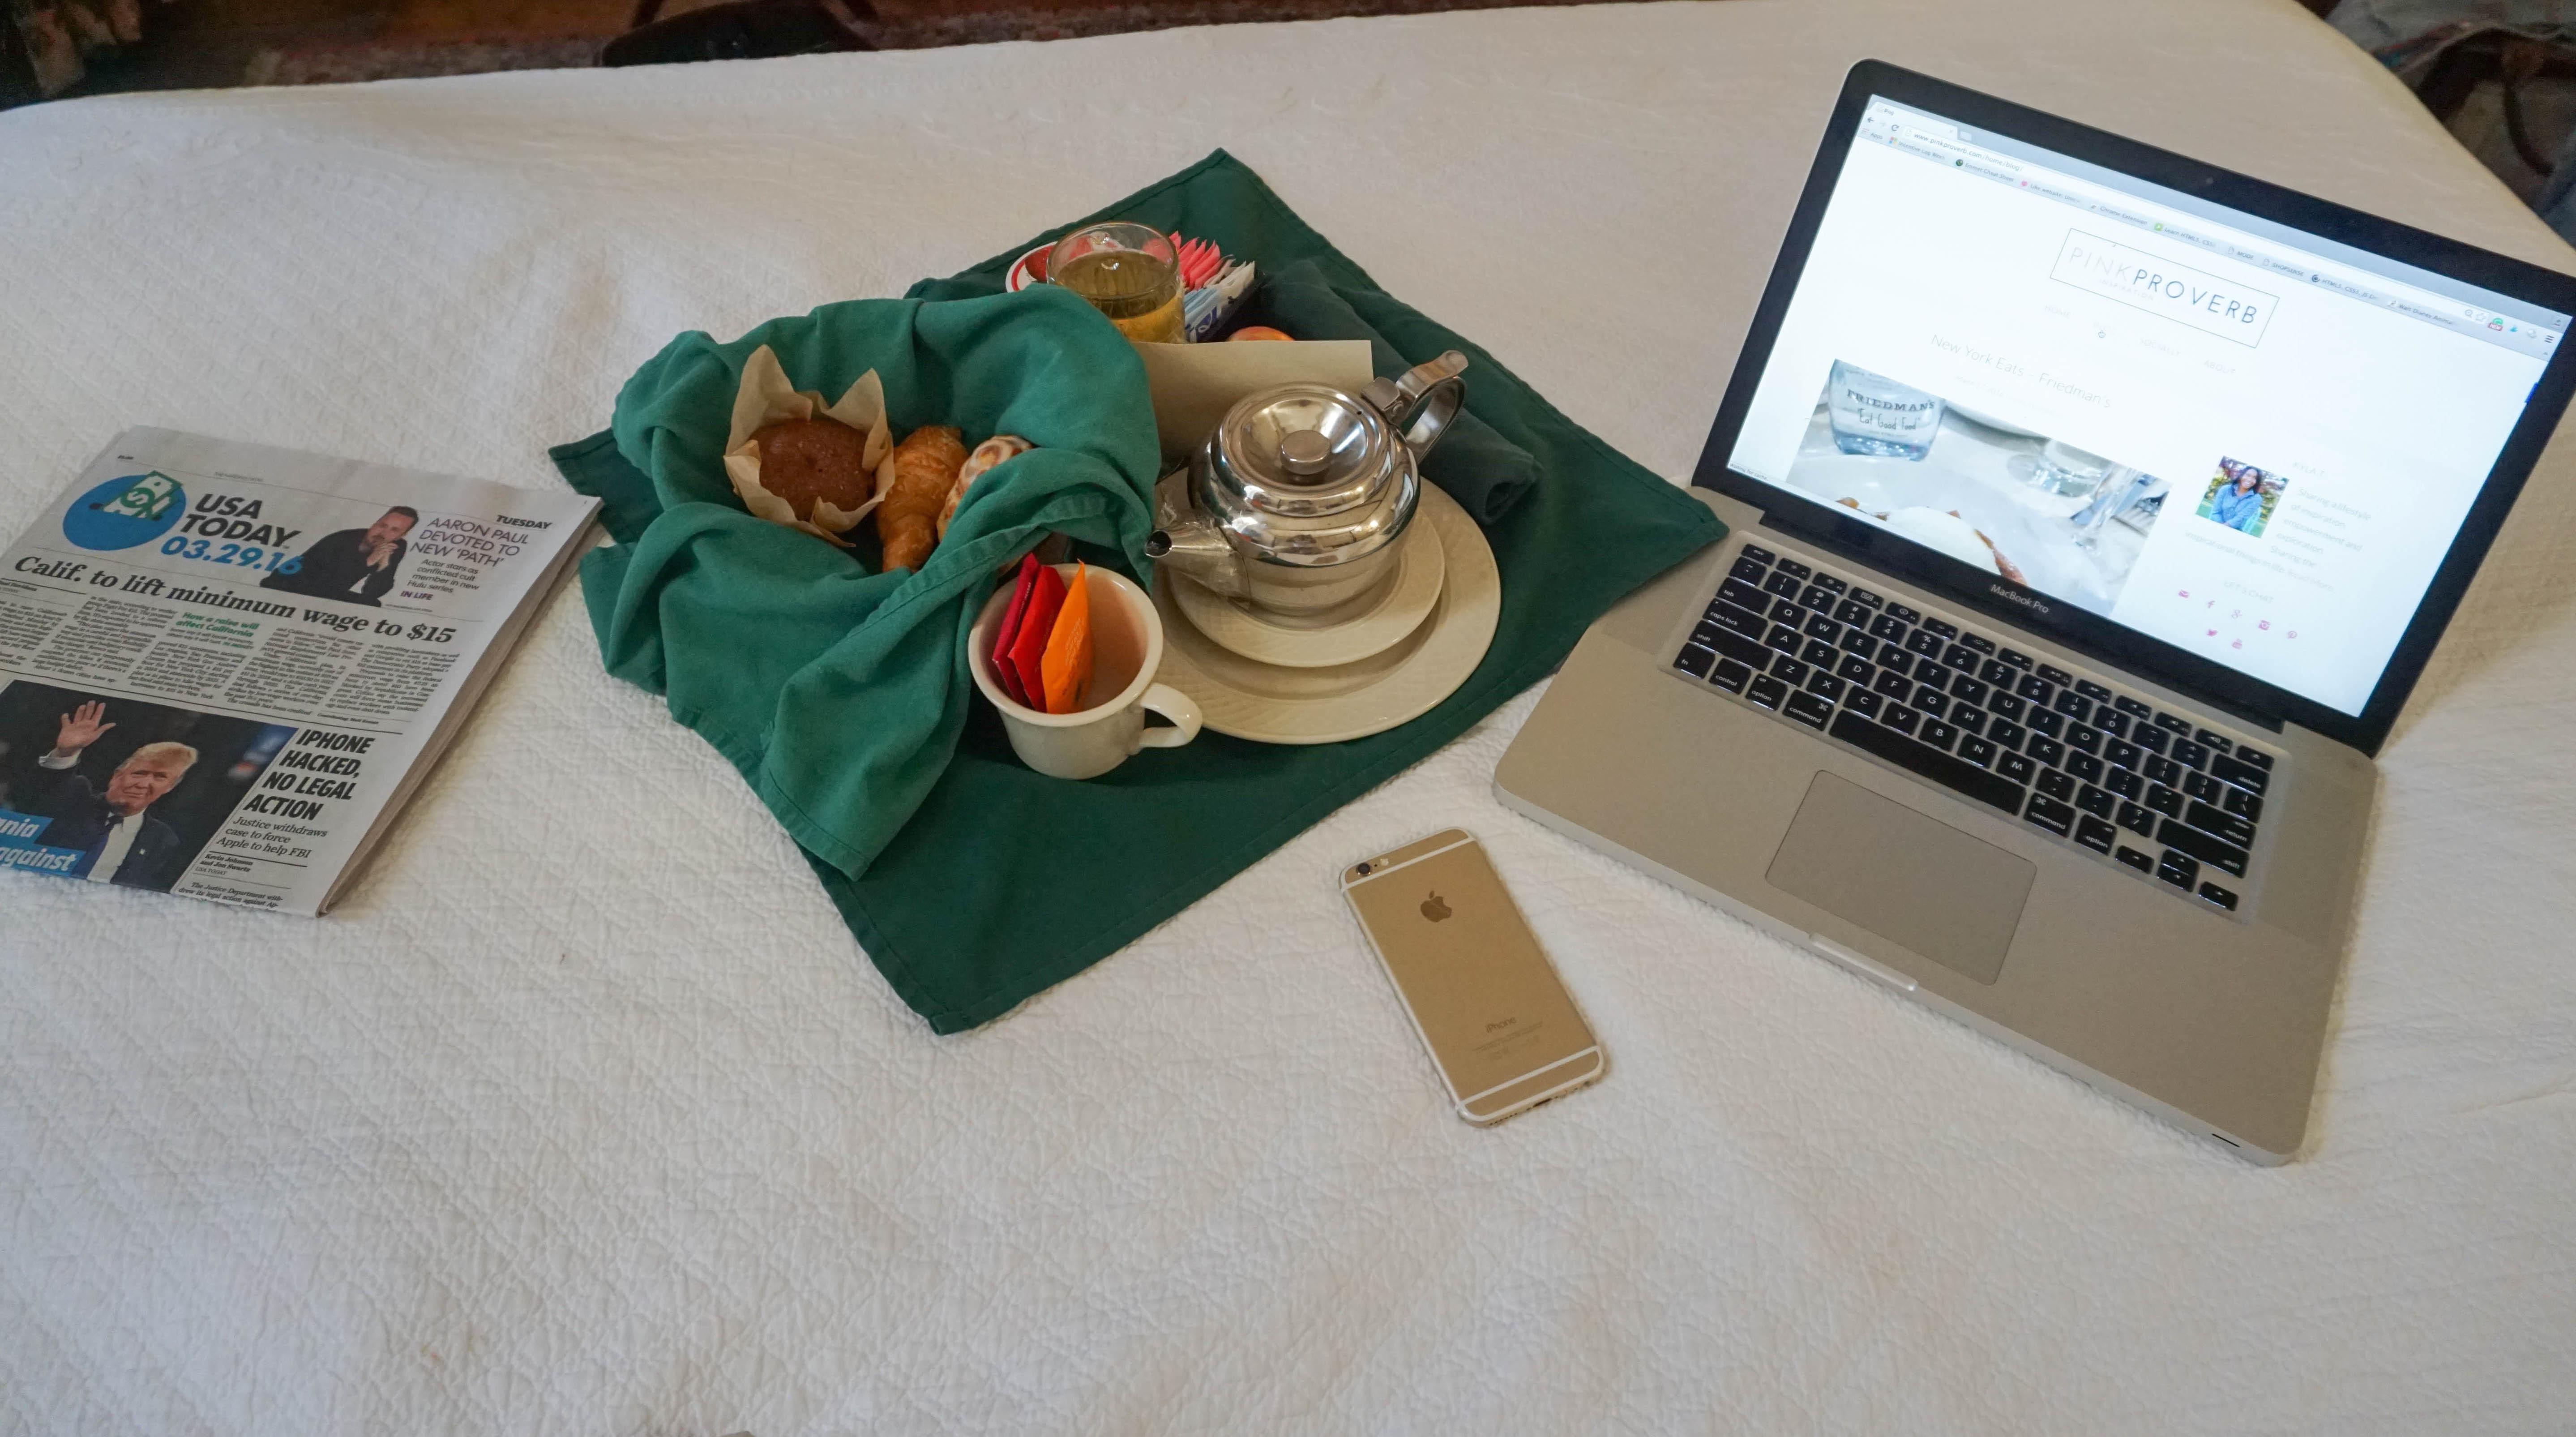 Breakfast-in-bed-charleston-south-carolina